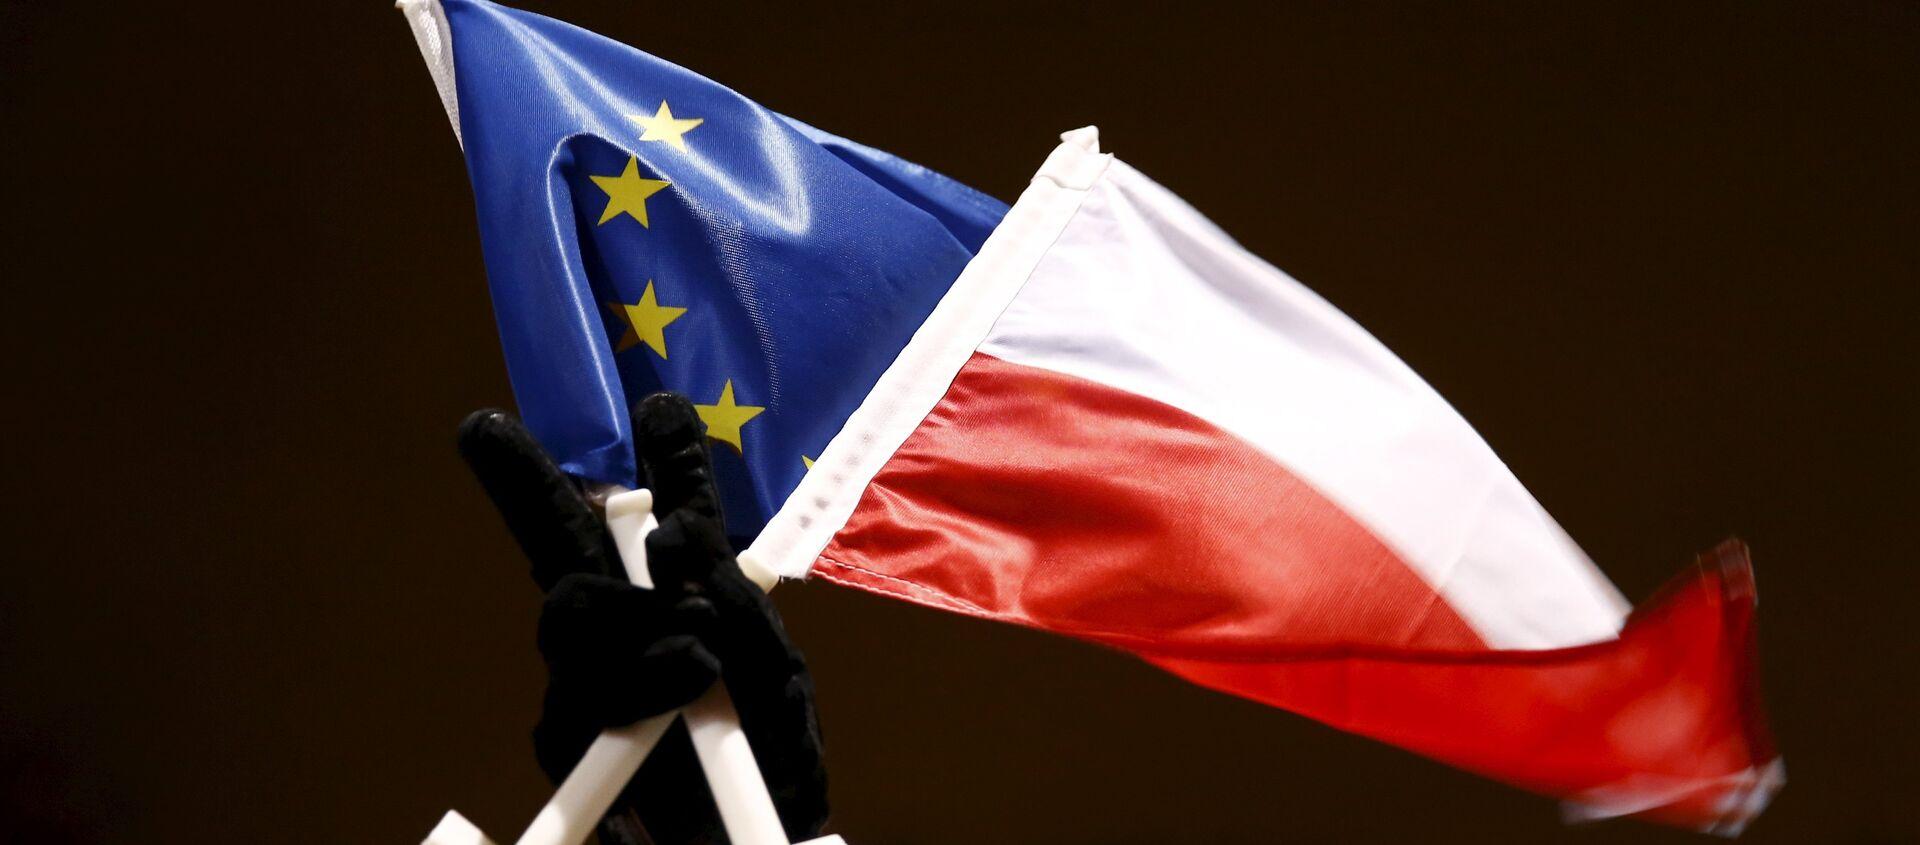 Flaga Polski i Unii Europejskiej - Sputnik Polska, 1920, 26.05.2021